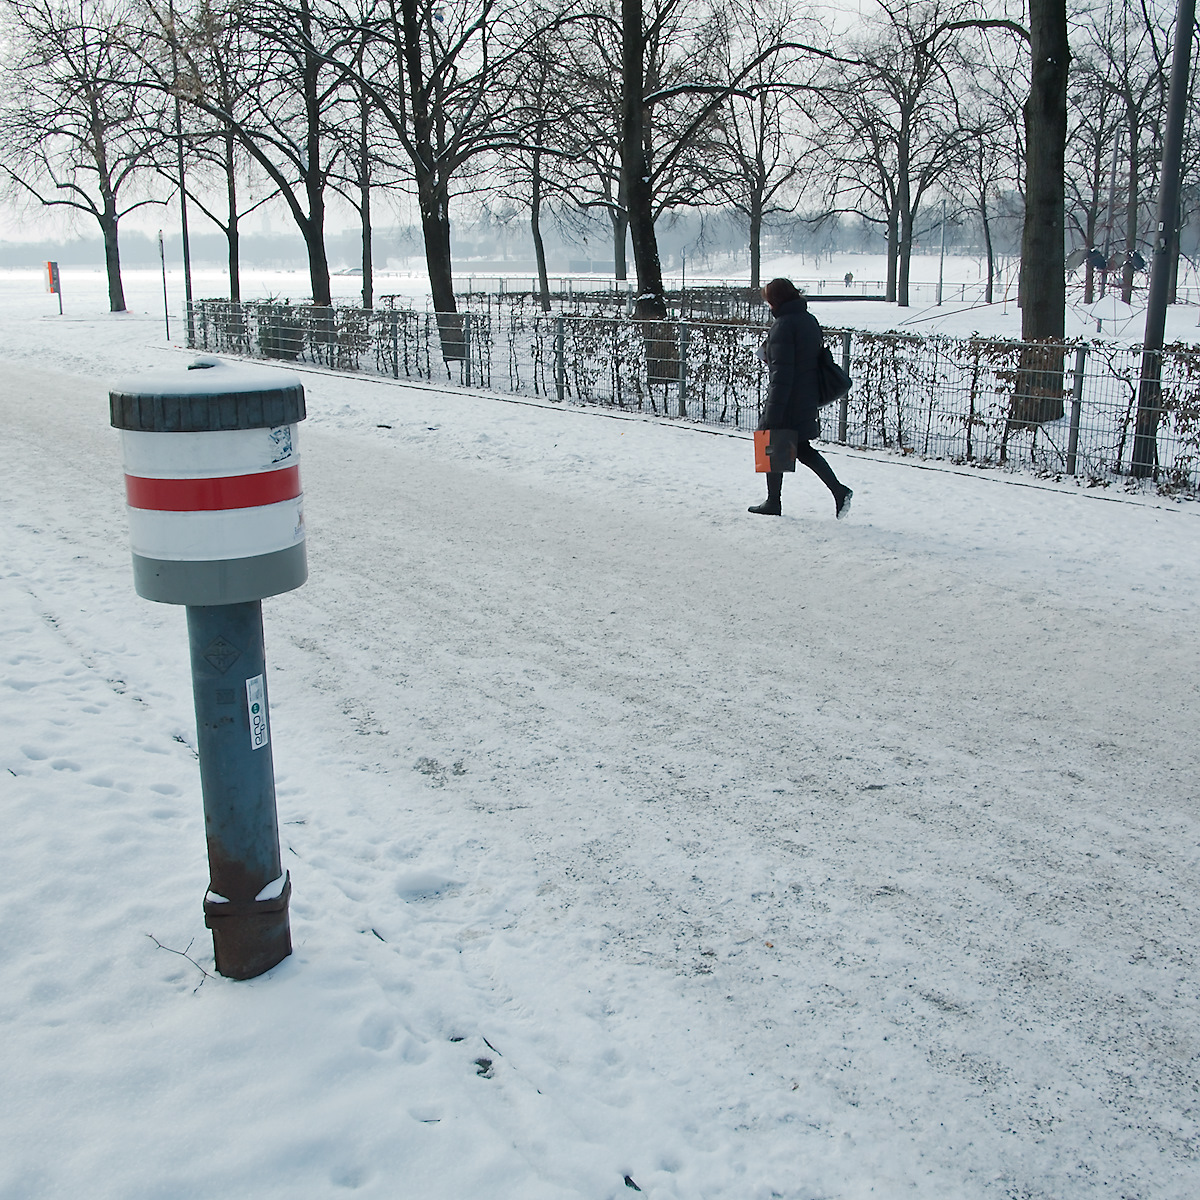 Hydrant, Snow